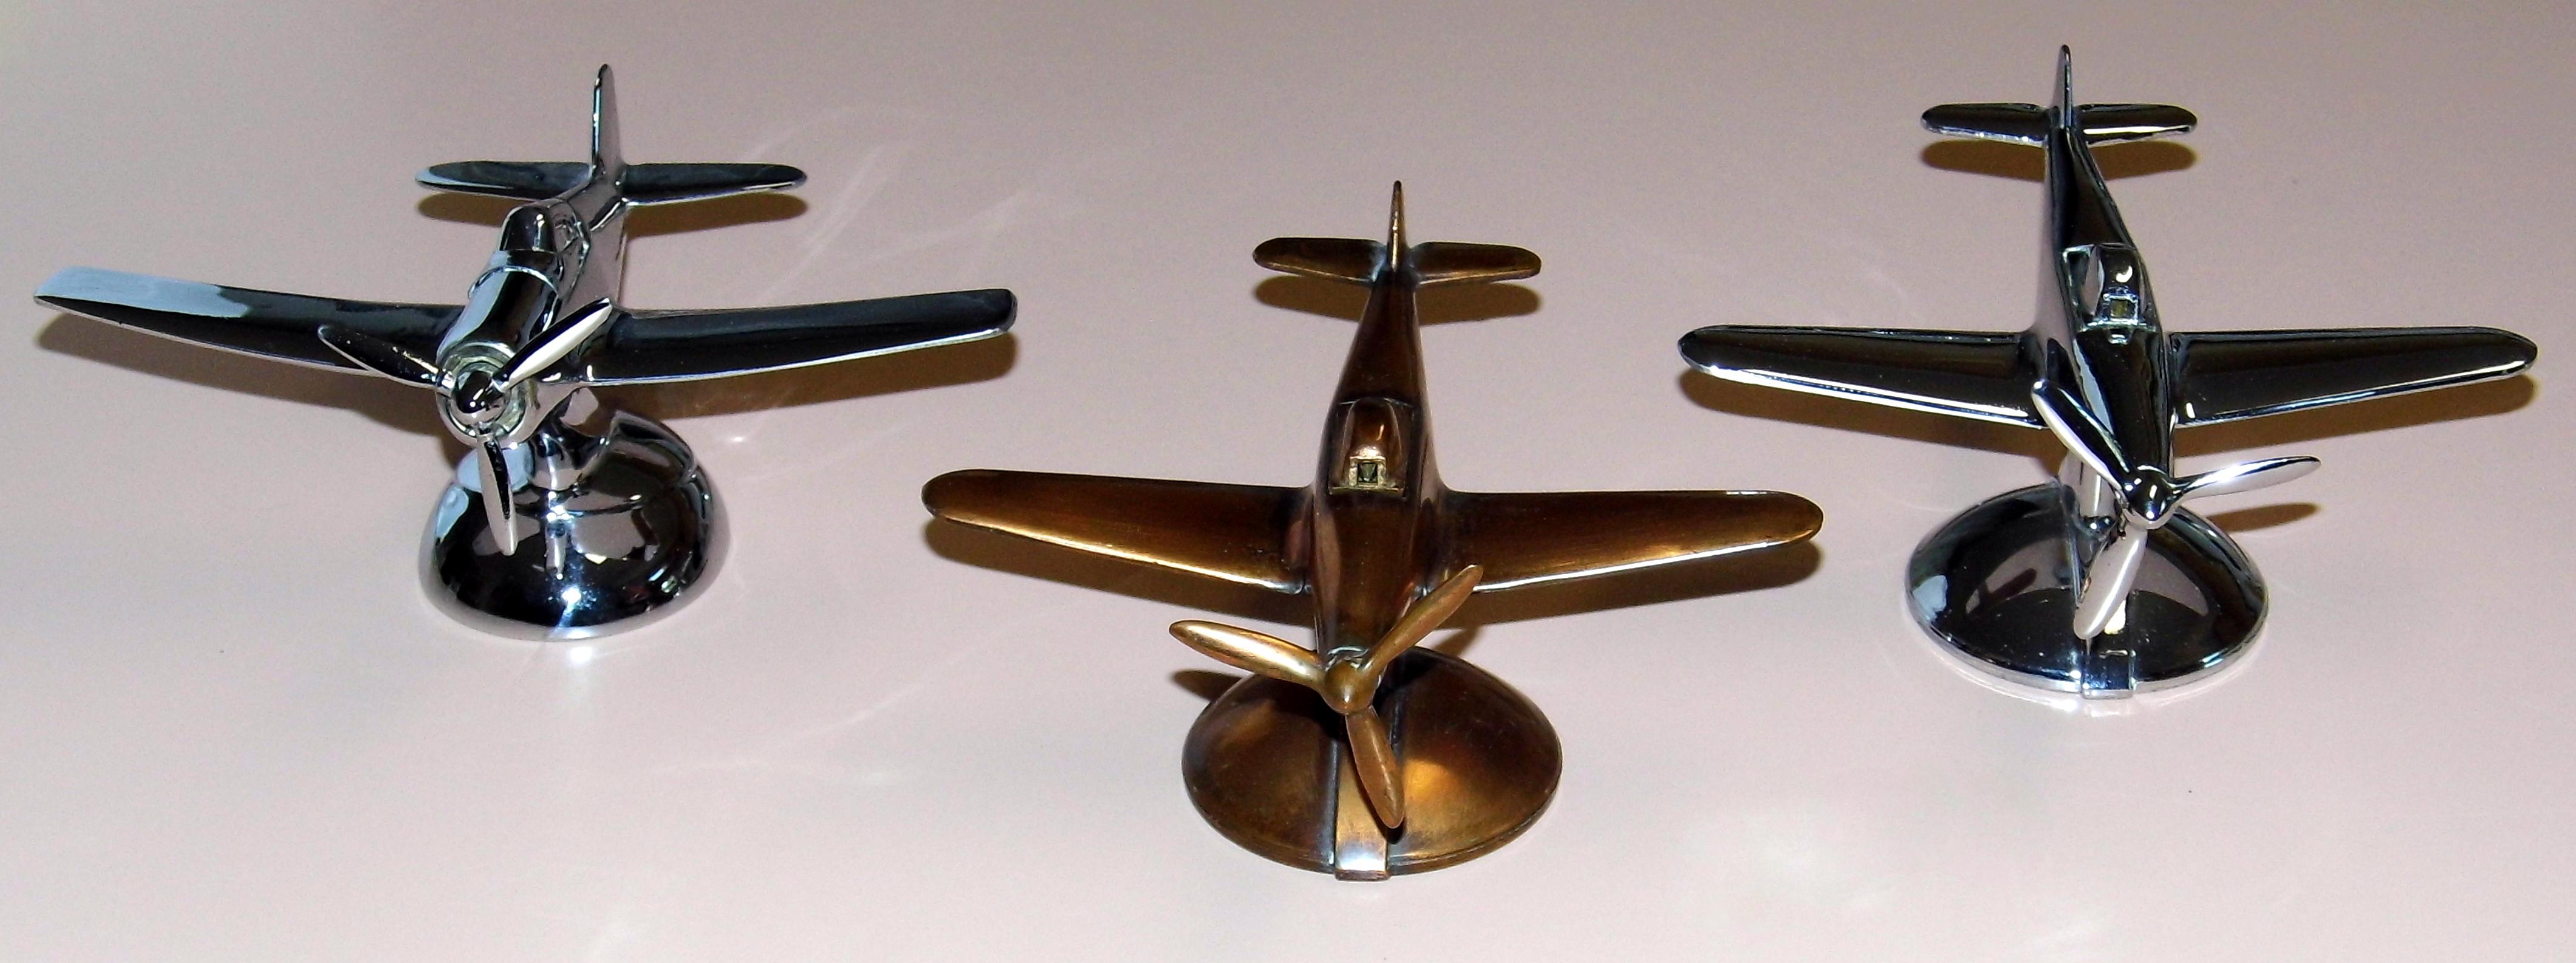 Sensational File A Flight Of Vintage Negbaur Table Airplane Shaped Interior Design Ideas Gentotryabchikinfo